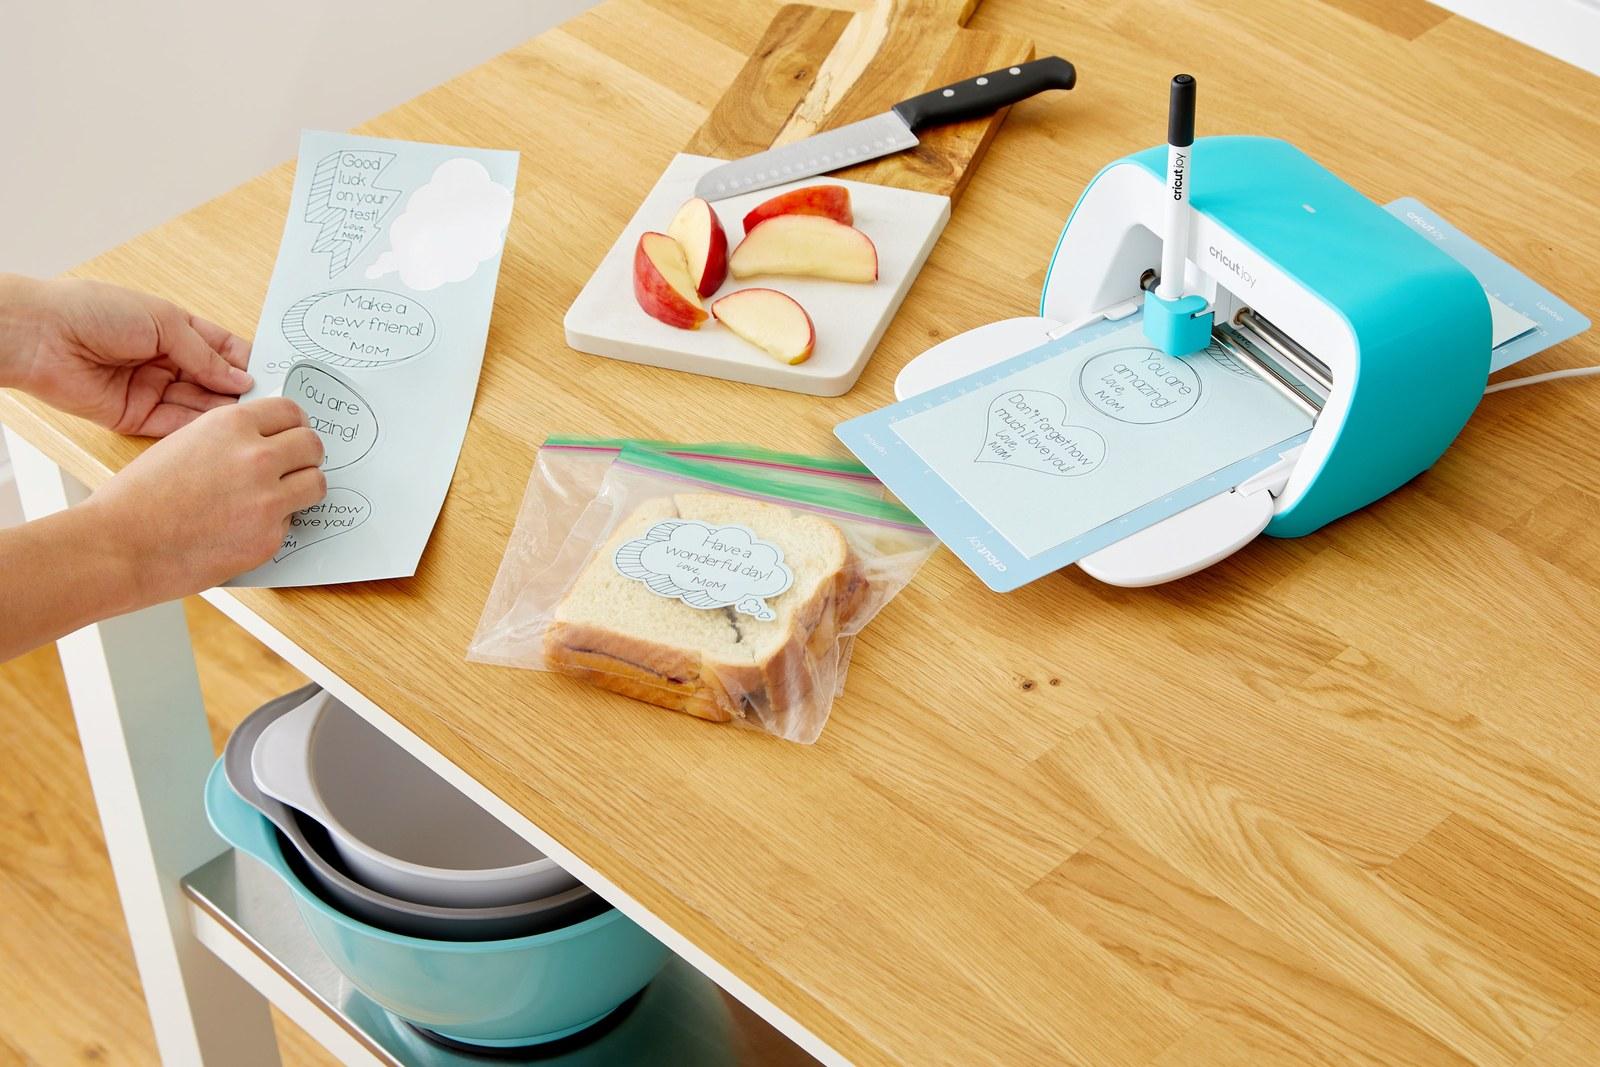 Cricut Joy - The Definitive Guide to an Ultra Portable Cutting Machine